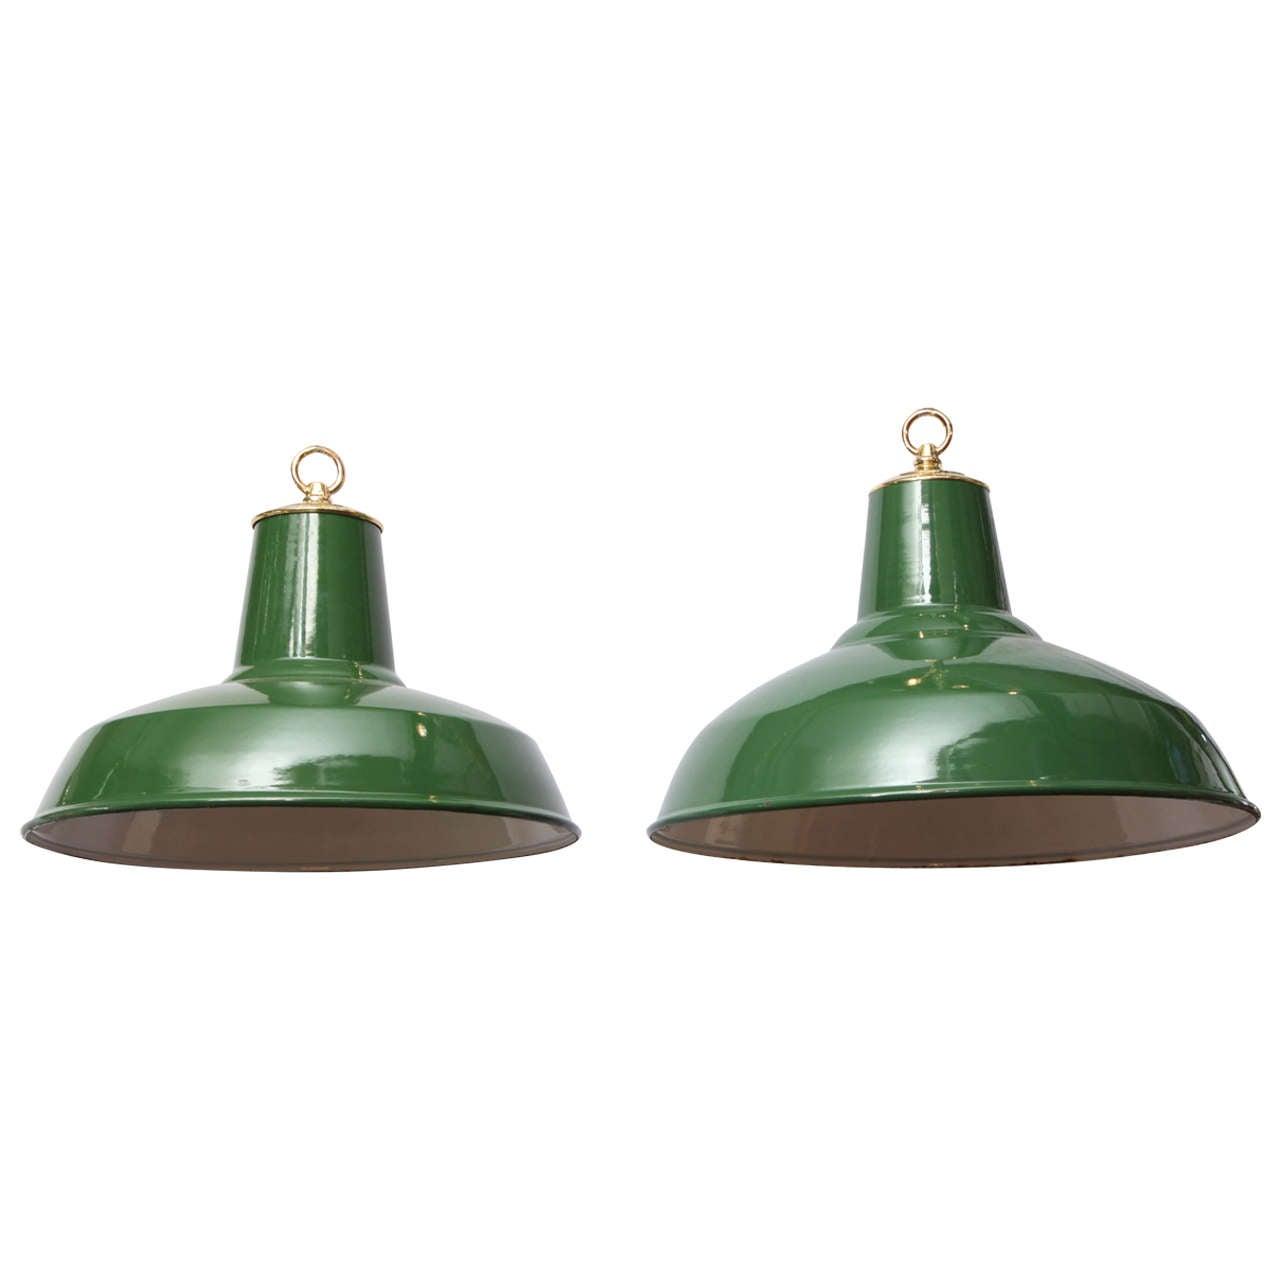 Hunter green enamel pendant lights for sale at 1stdibs hunter green enamel pendant lights for sale aloadofball Choice Image